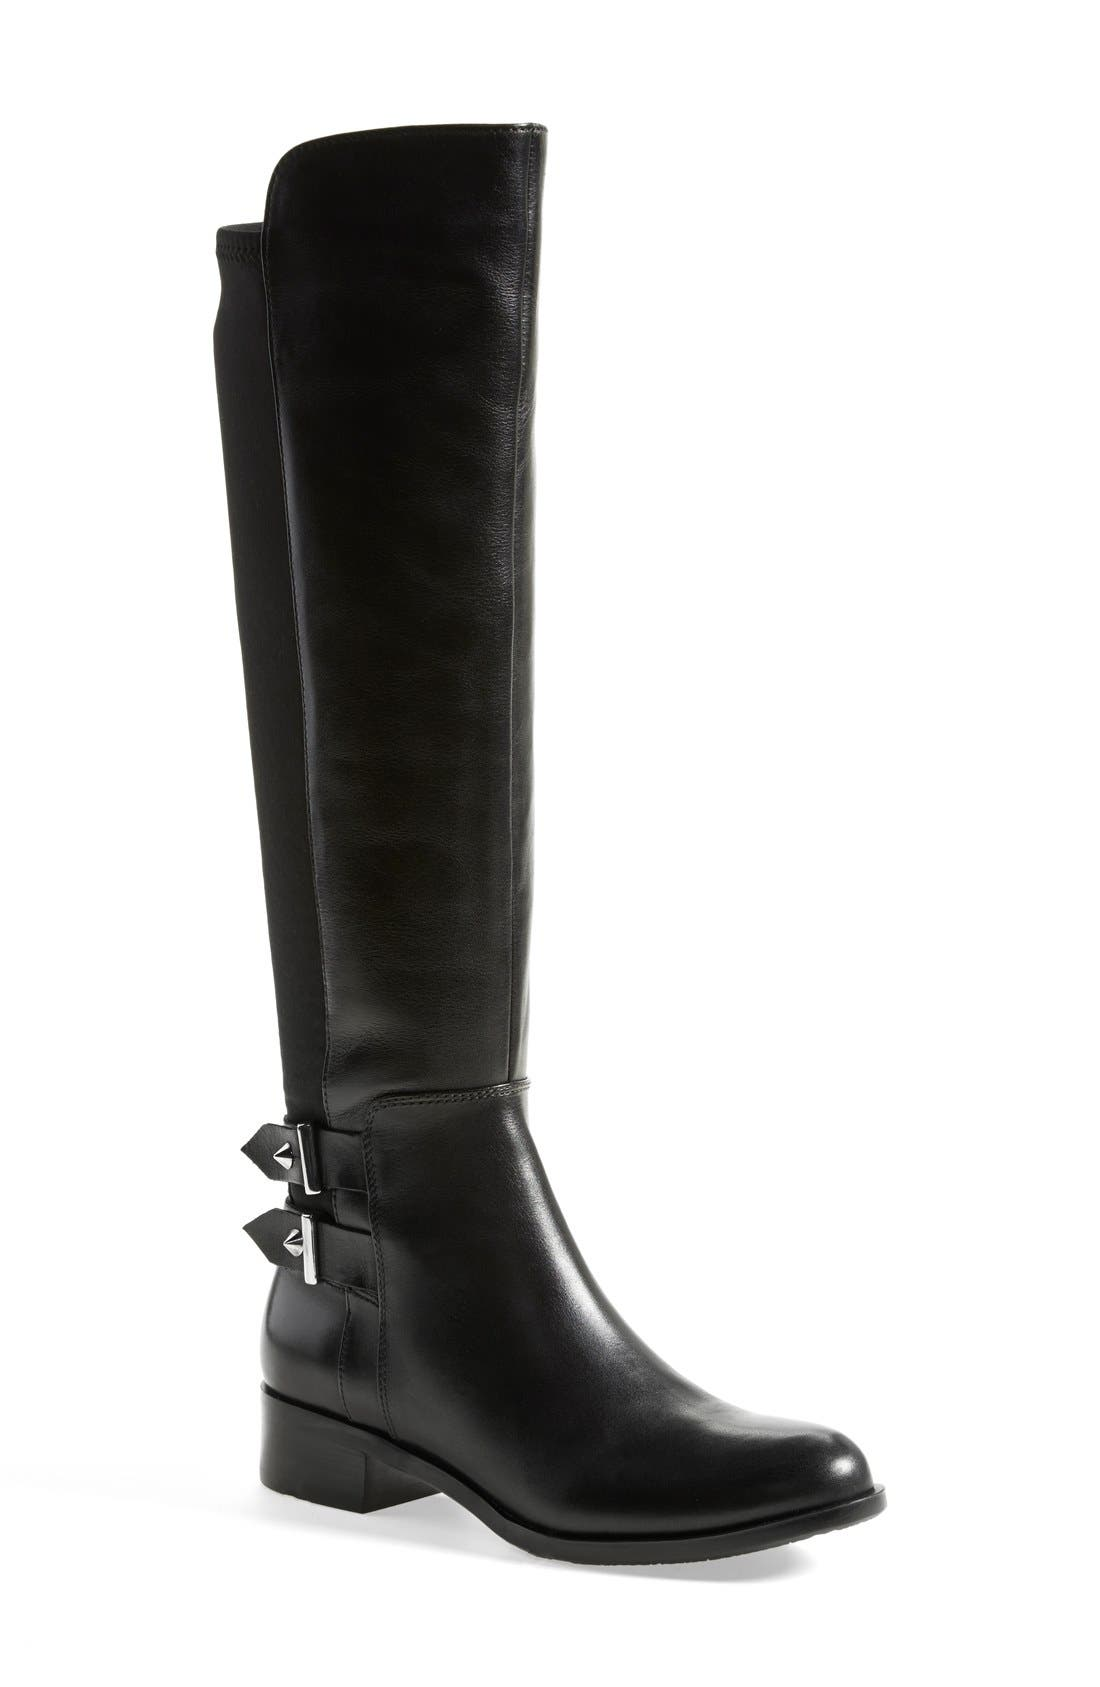 Alternate Image 1 Selected - Ivanka Trump 'Onna' Over The Knee Boot (Women)